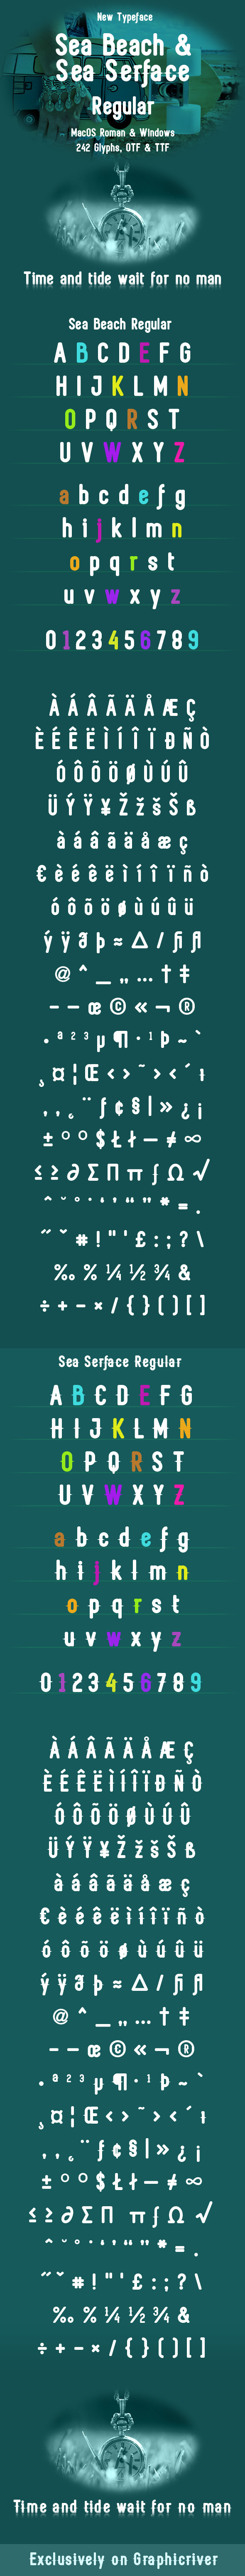 Sea Beach & Sea Surface Regular